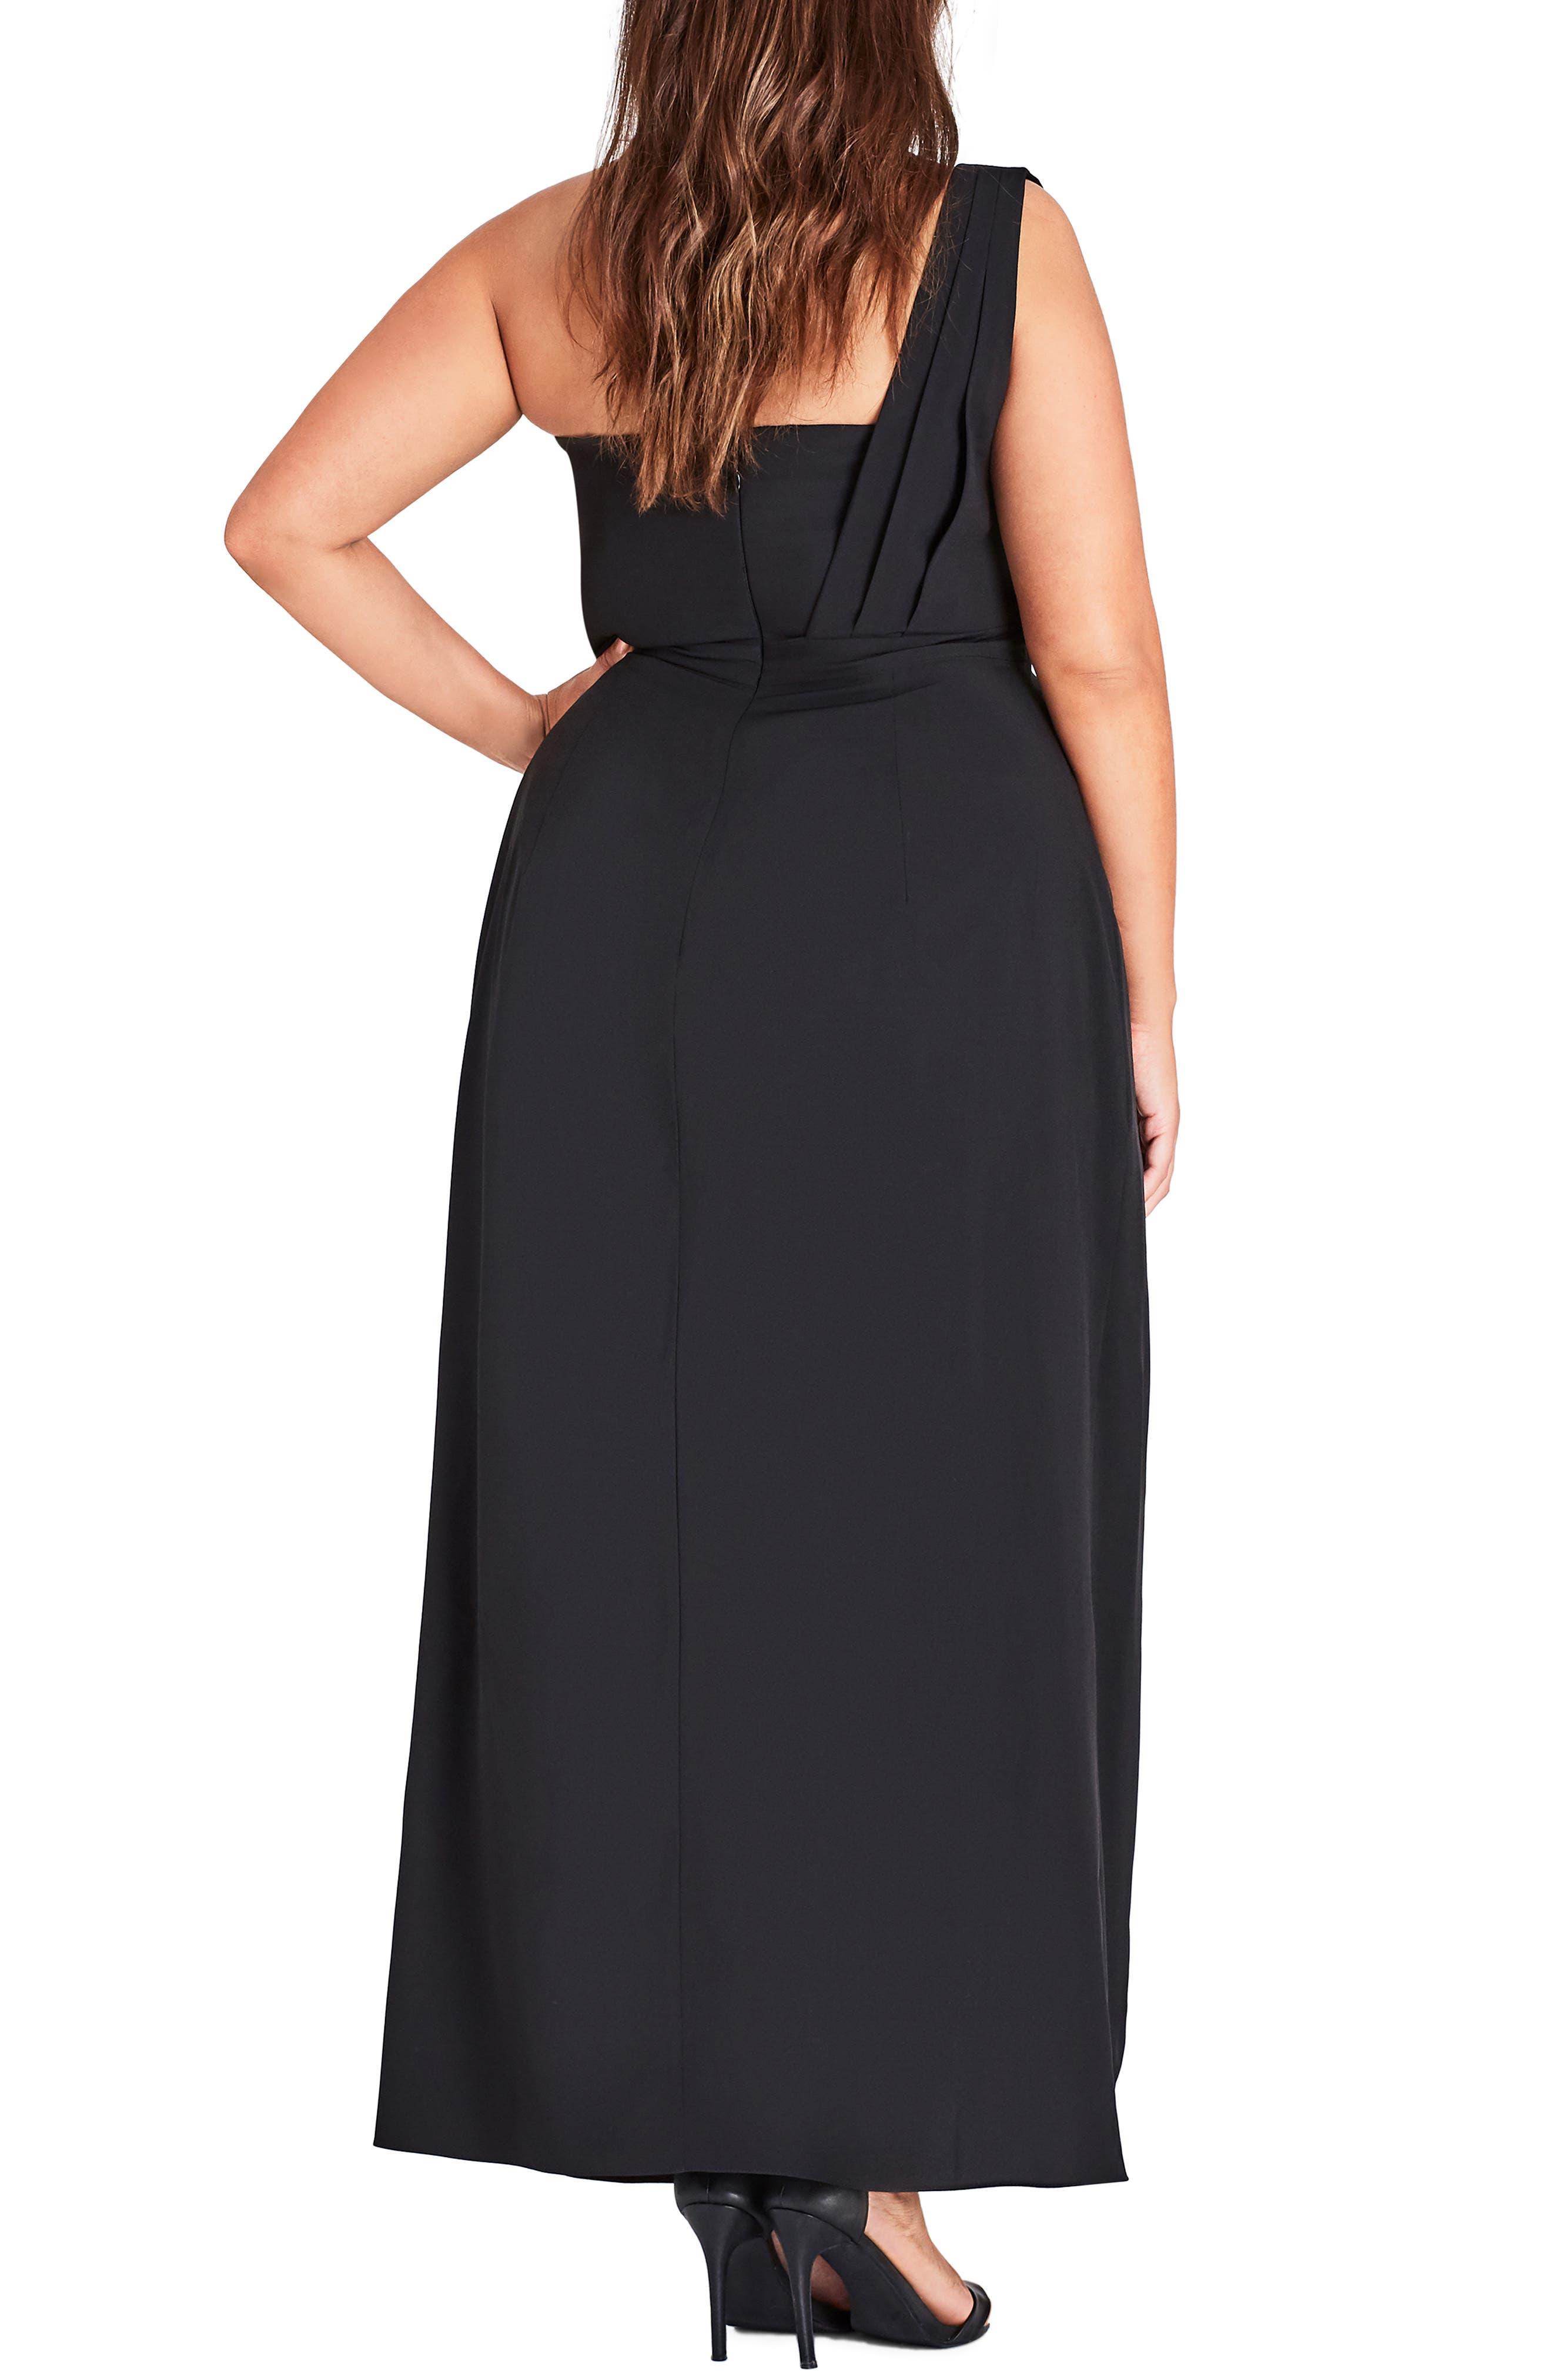 CITY CHIC, Allure One-Shoulder Maxi Dress, Alternate thumbnail 2, color, BLACK